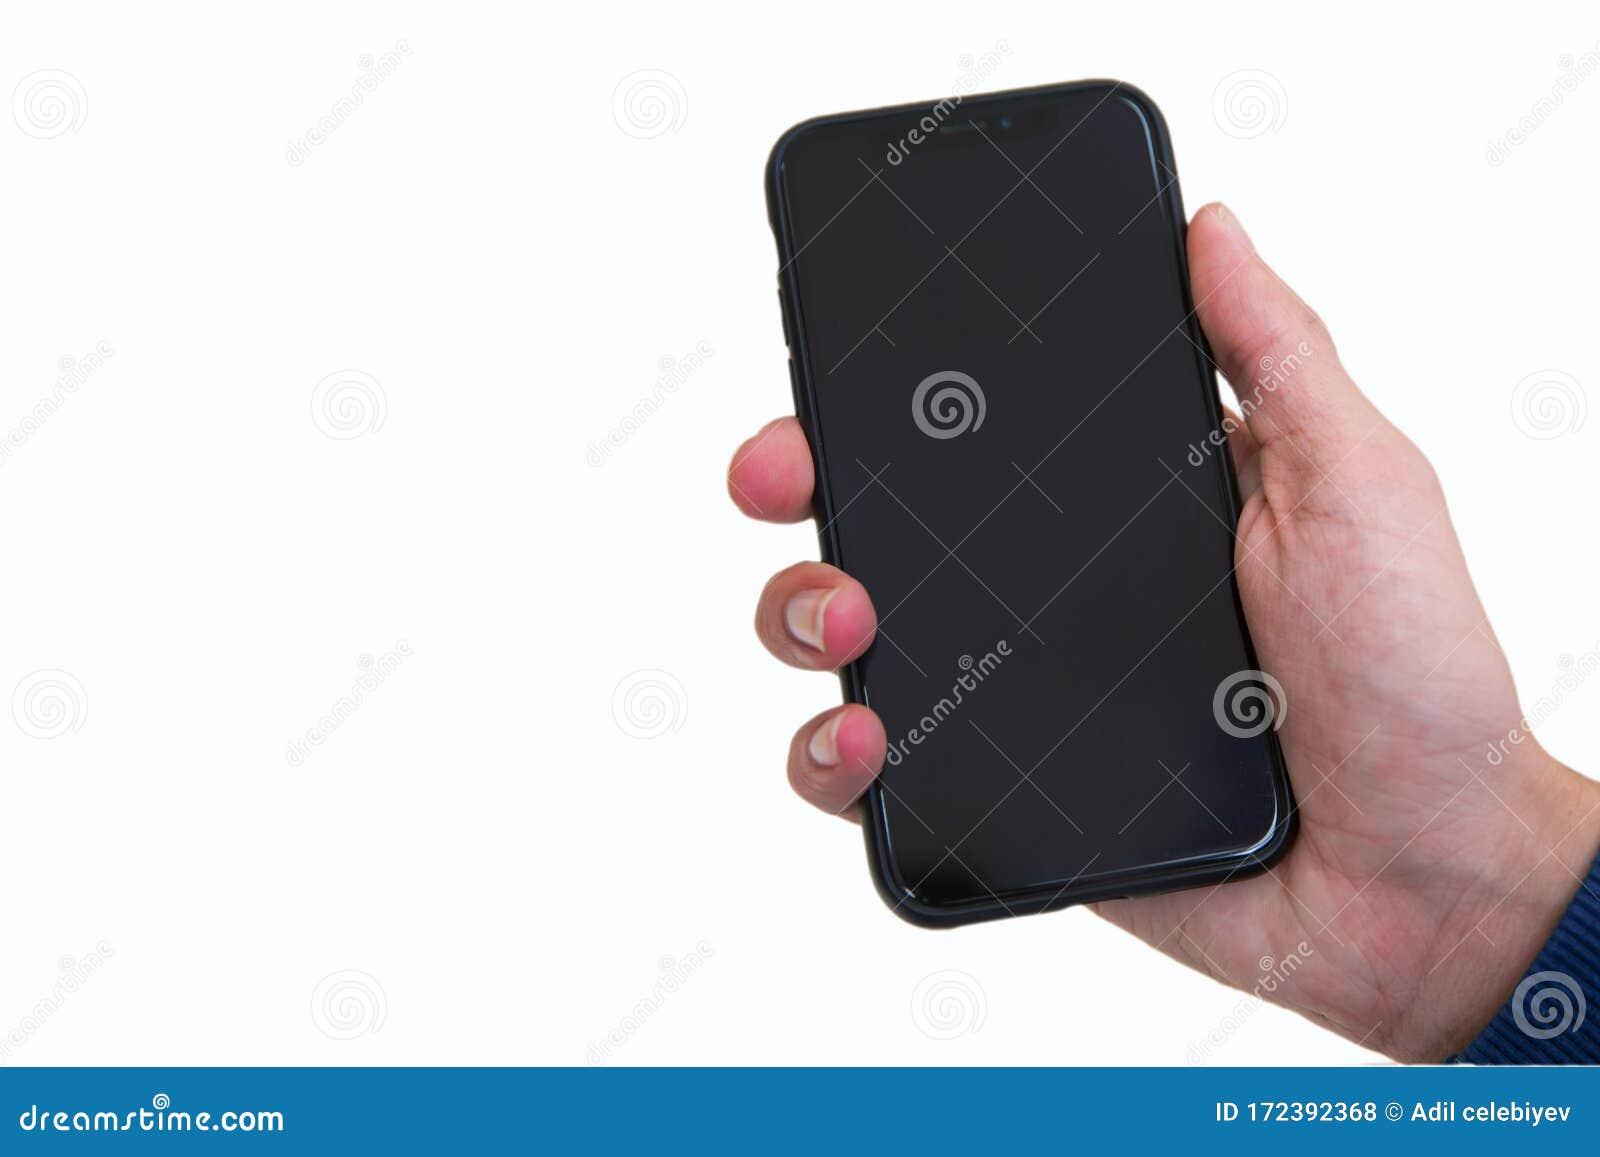 boy hand holding black modern smartphone empty screen isolated white background mockup man presenting smart phone 172392368